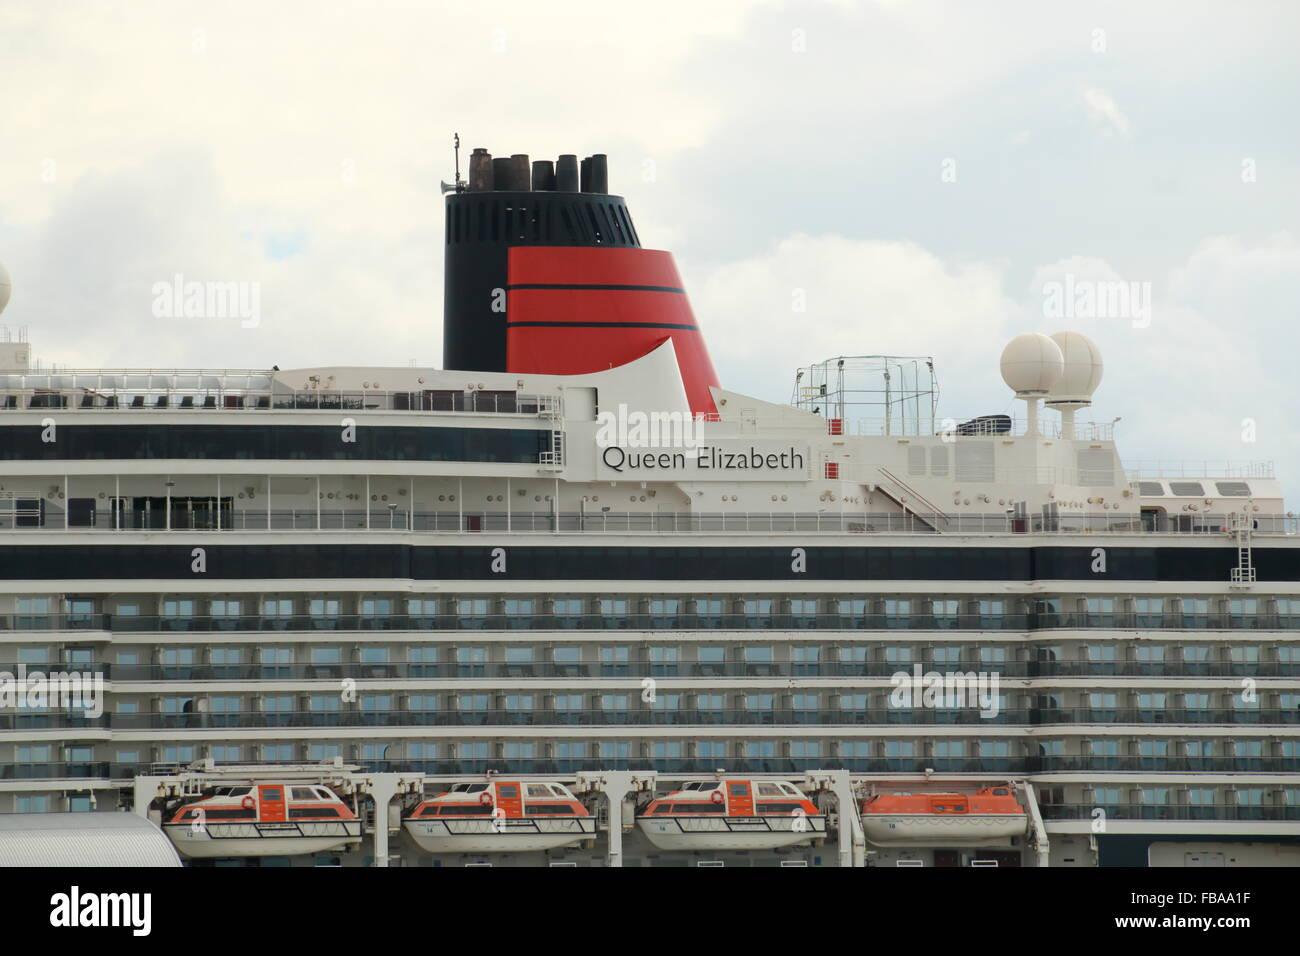 Upper decks of cruise ship Queen Elizabeth,Southampton,UK - Stock Image